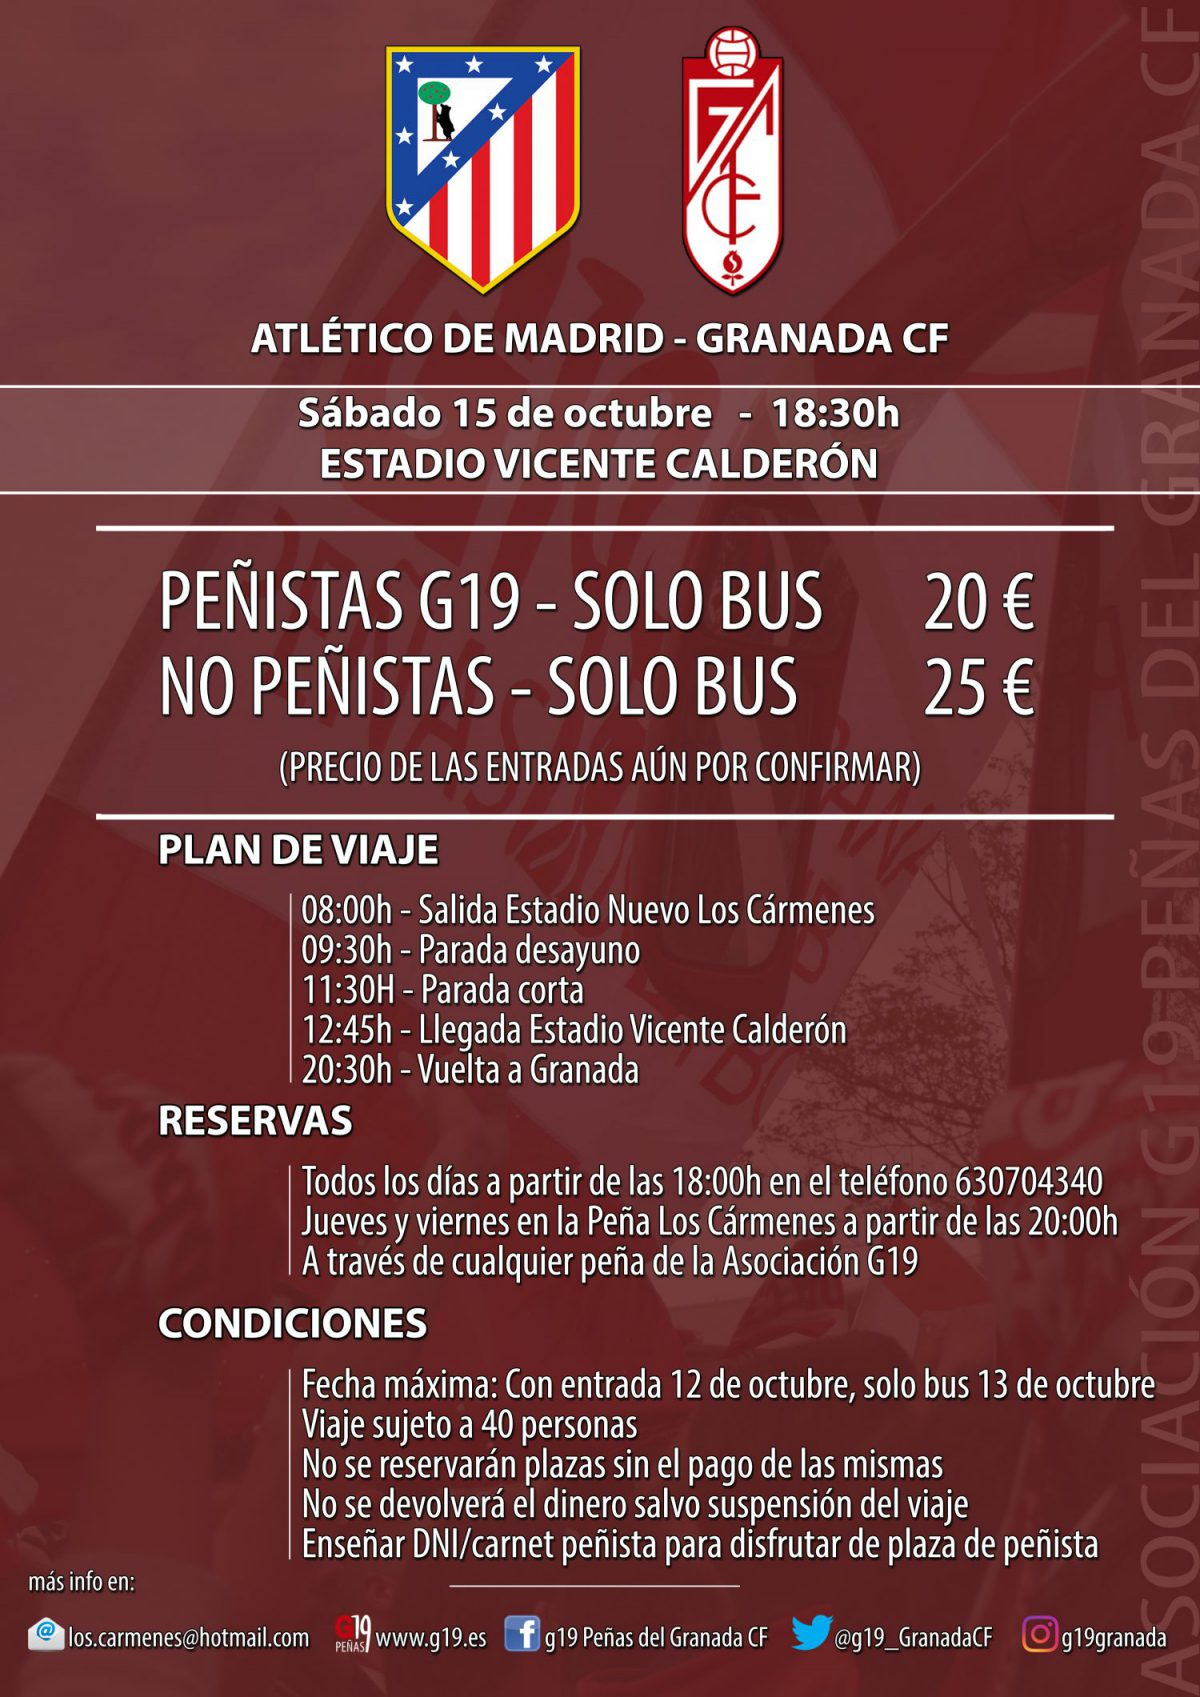 Viaje al Calderón. Imagen: @jaferser